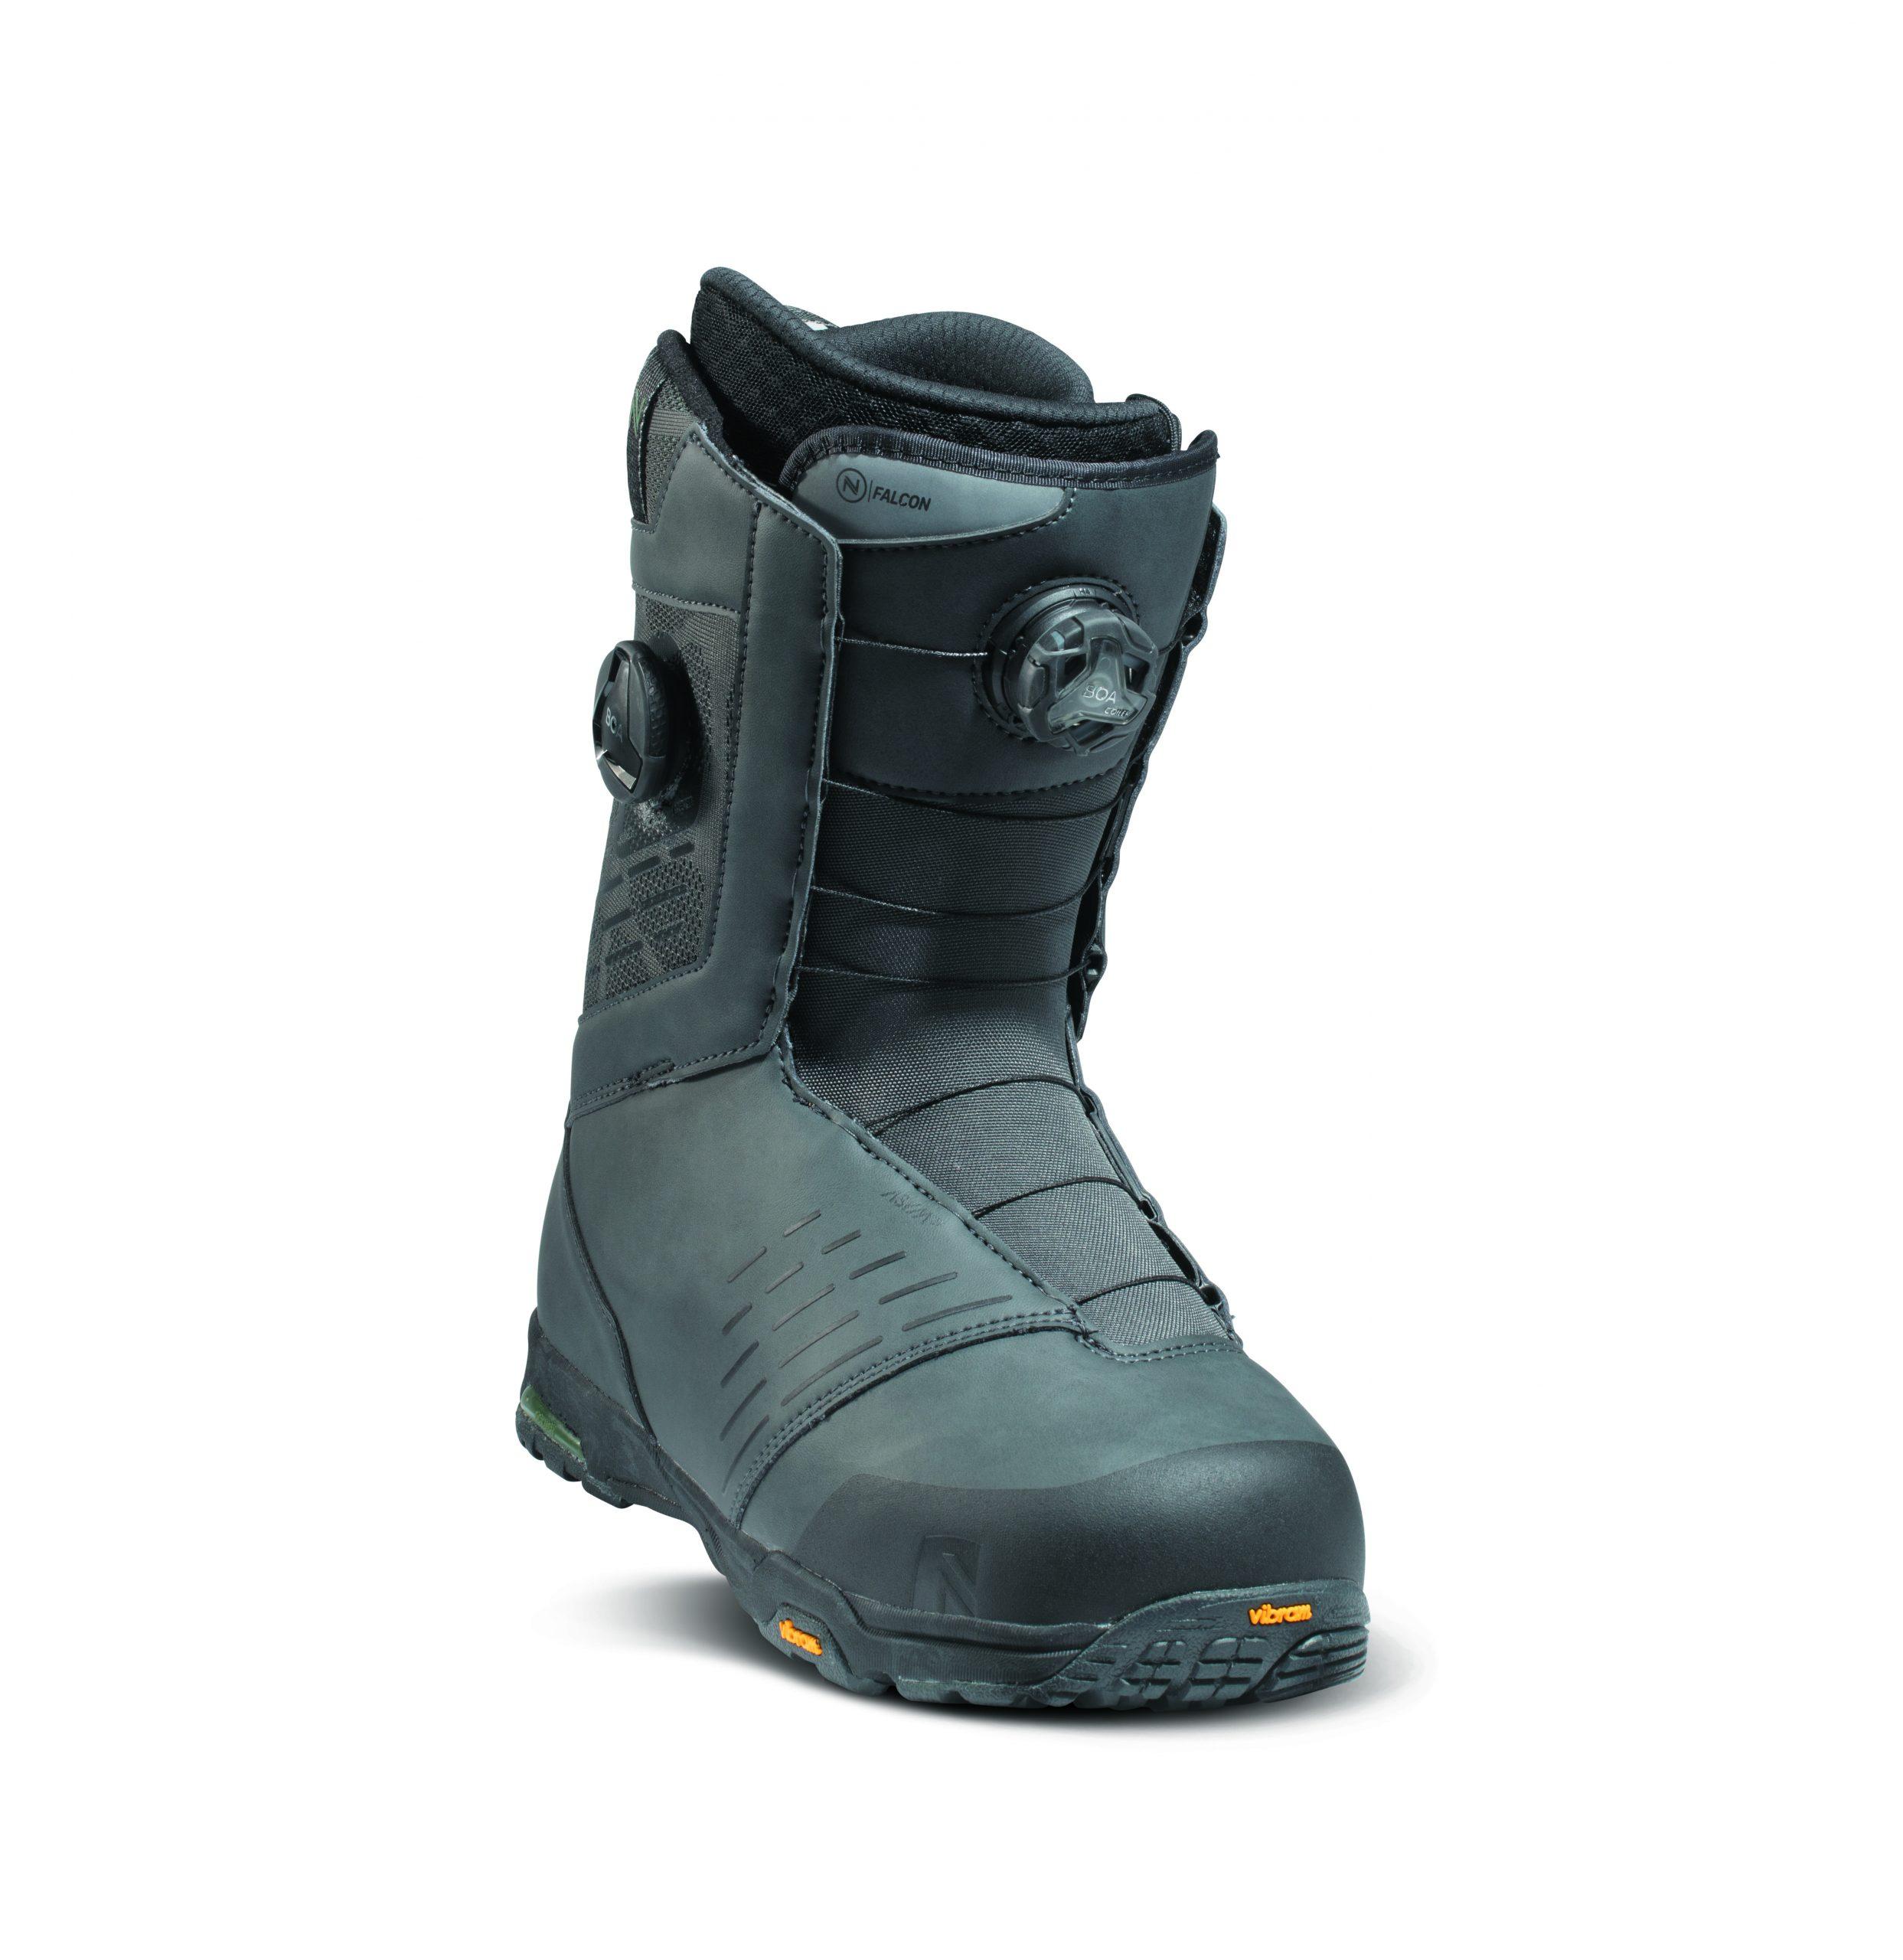 Nidecker FW20/21 Snowboard Boots